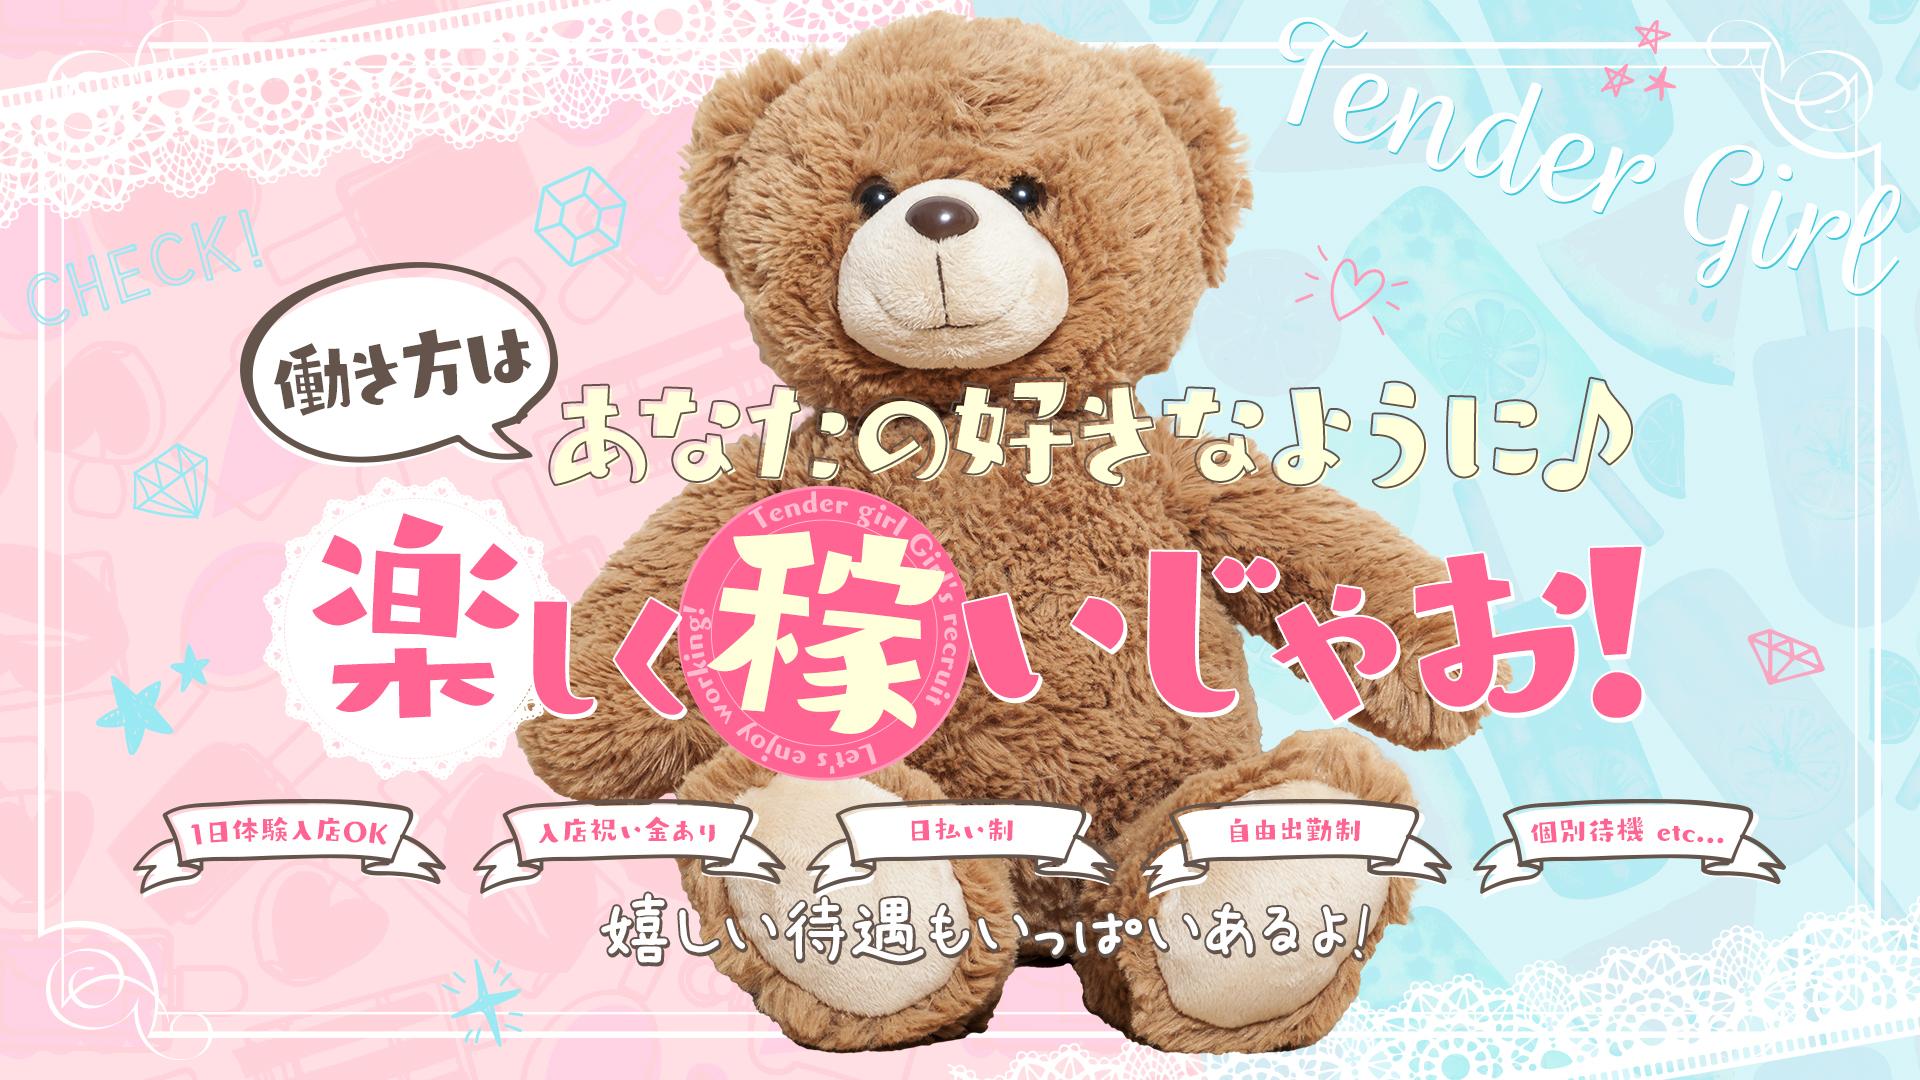 Tender Girl 仙台-テンダーガール-の求人画像